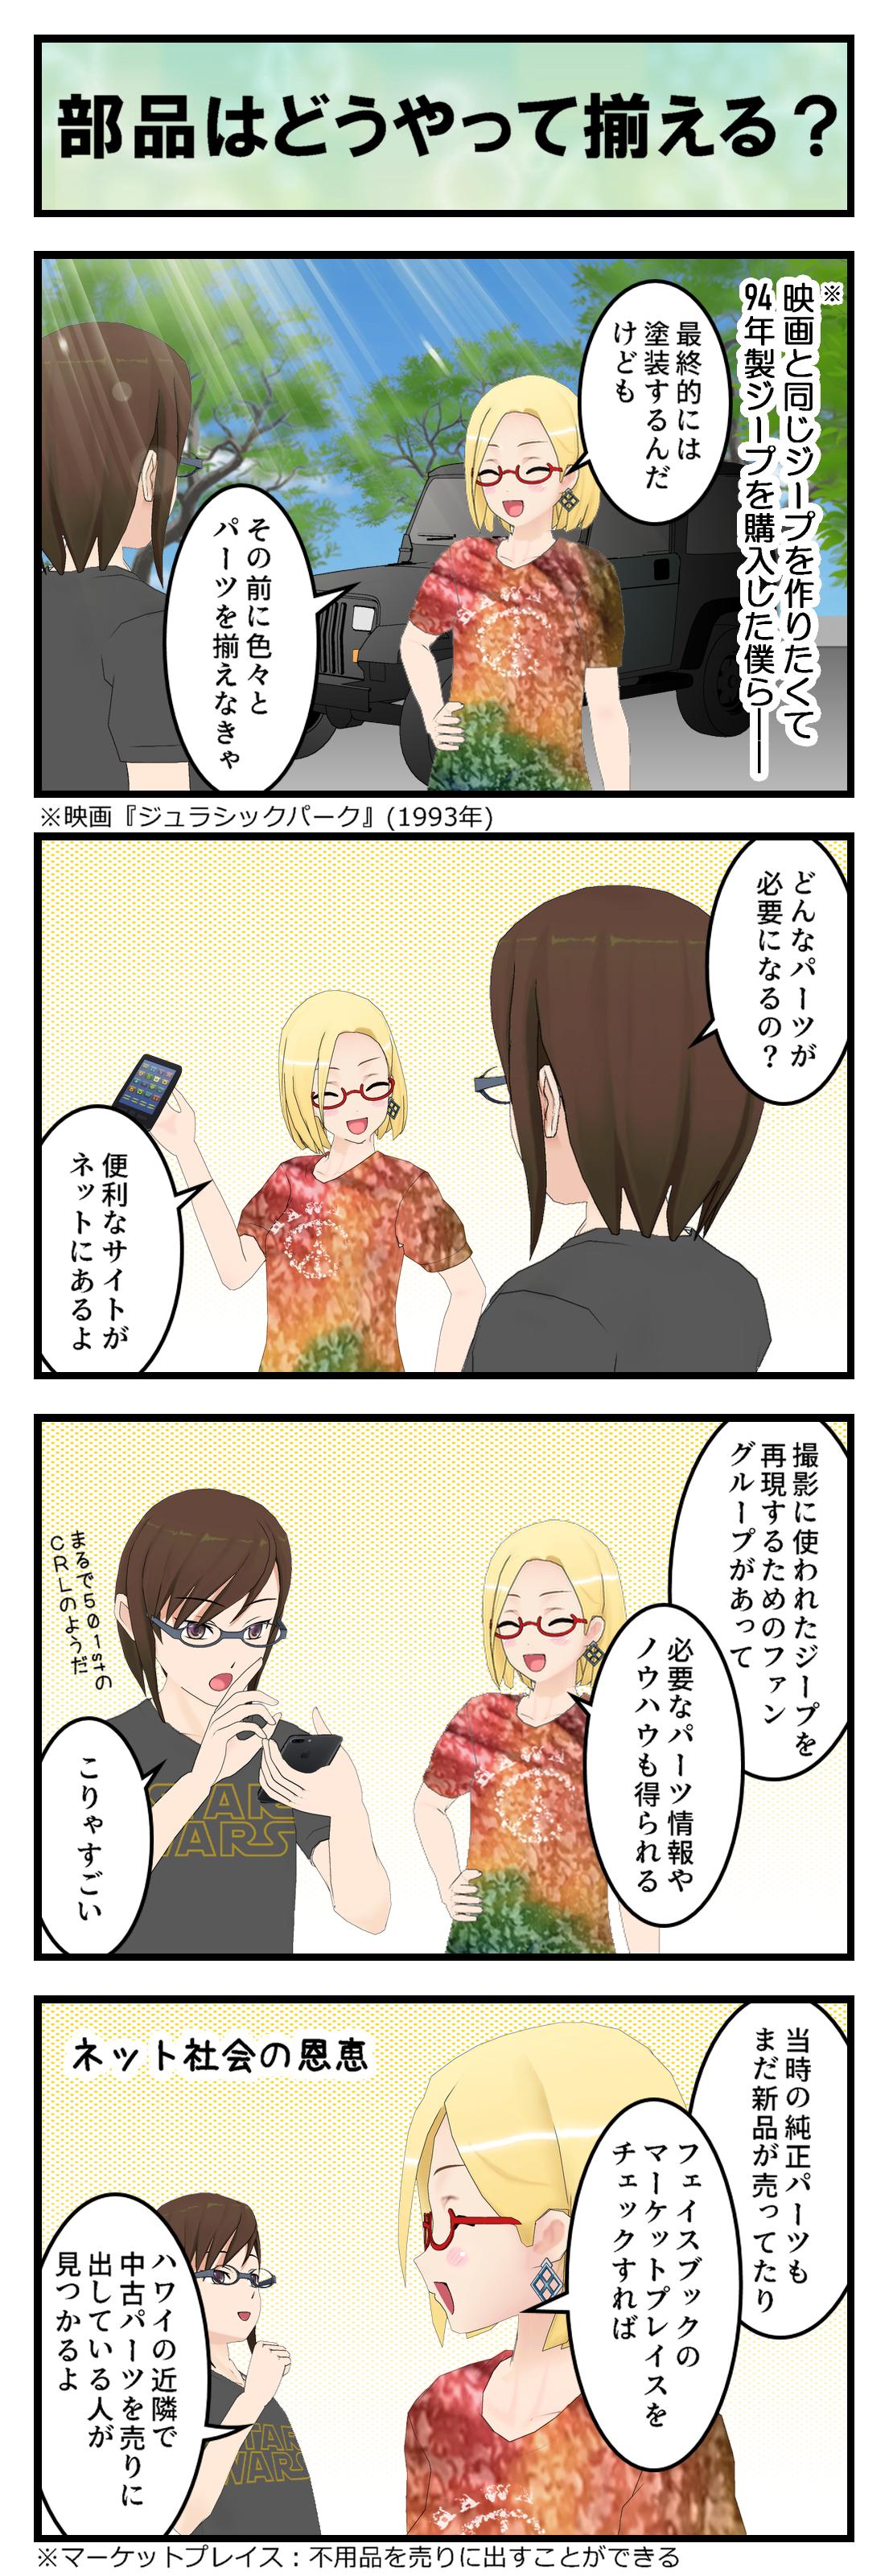 R718_パーツ集め_001